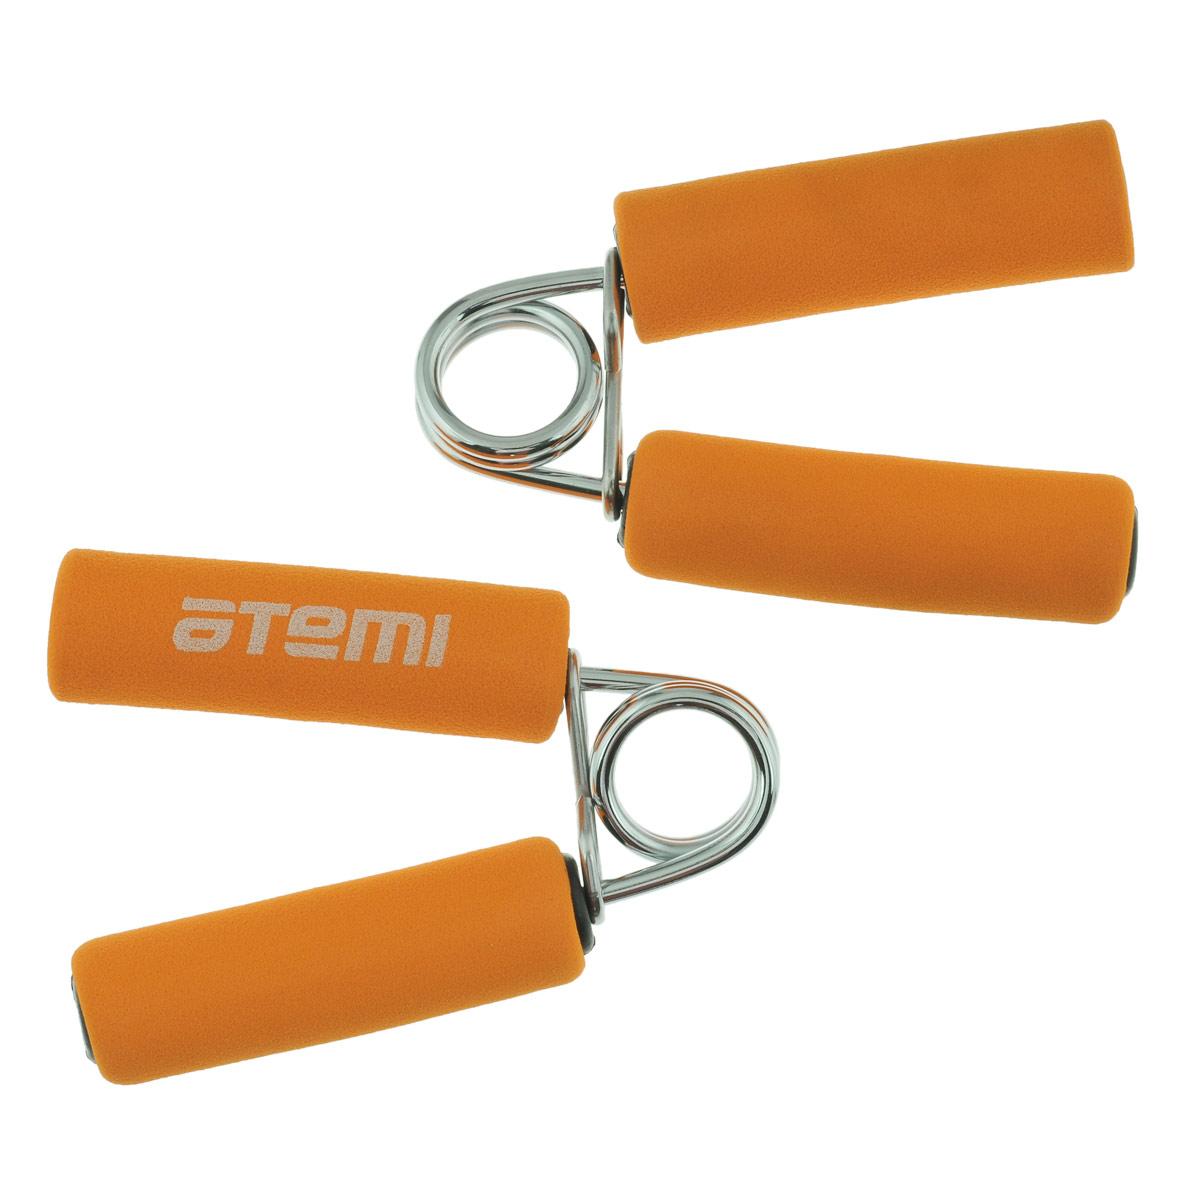 Эспандер кистевой Atemi, цвет: оранжевый, 2 шт. AHG-02 эспандер кистевой housefit dd 6403